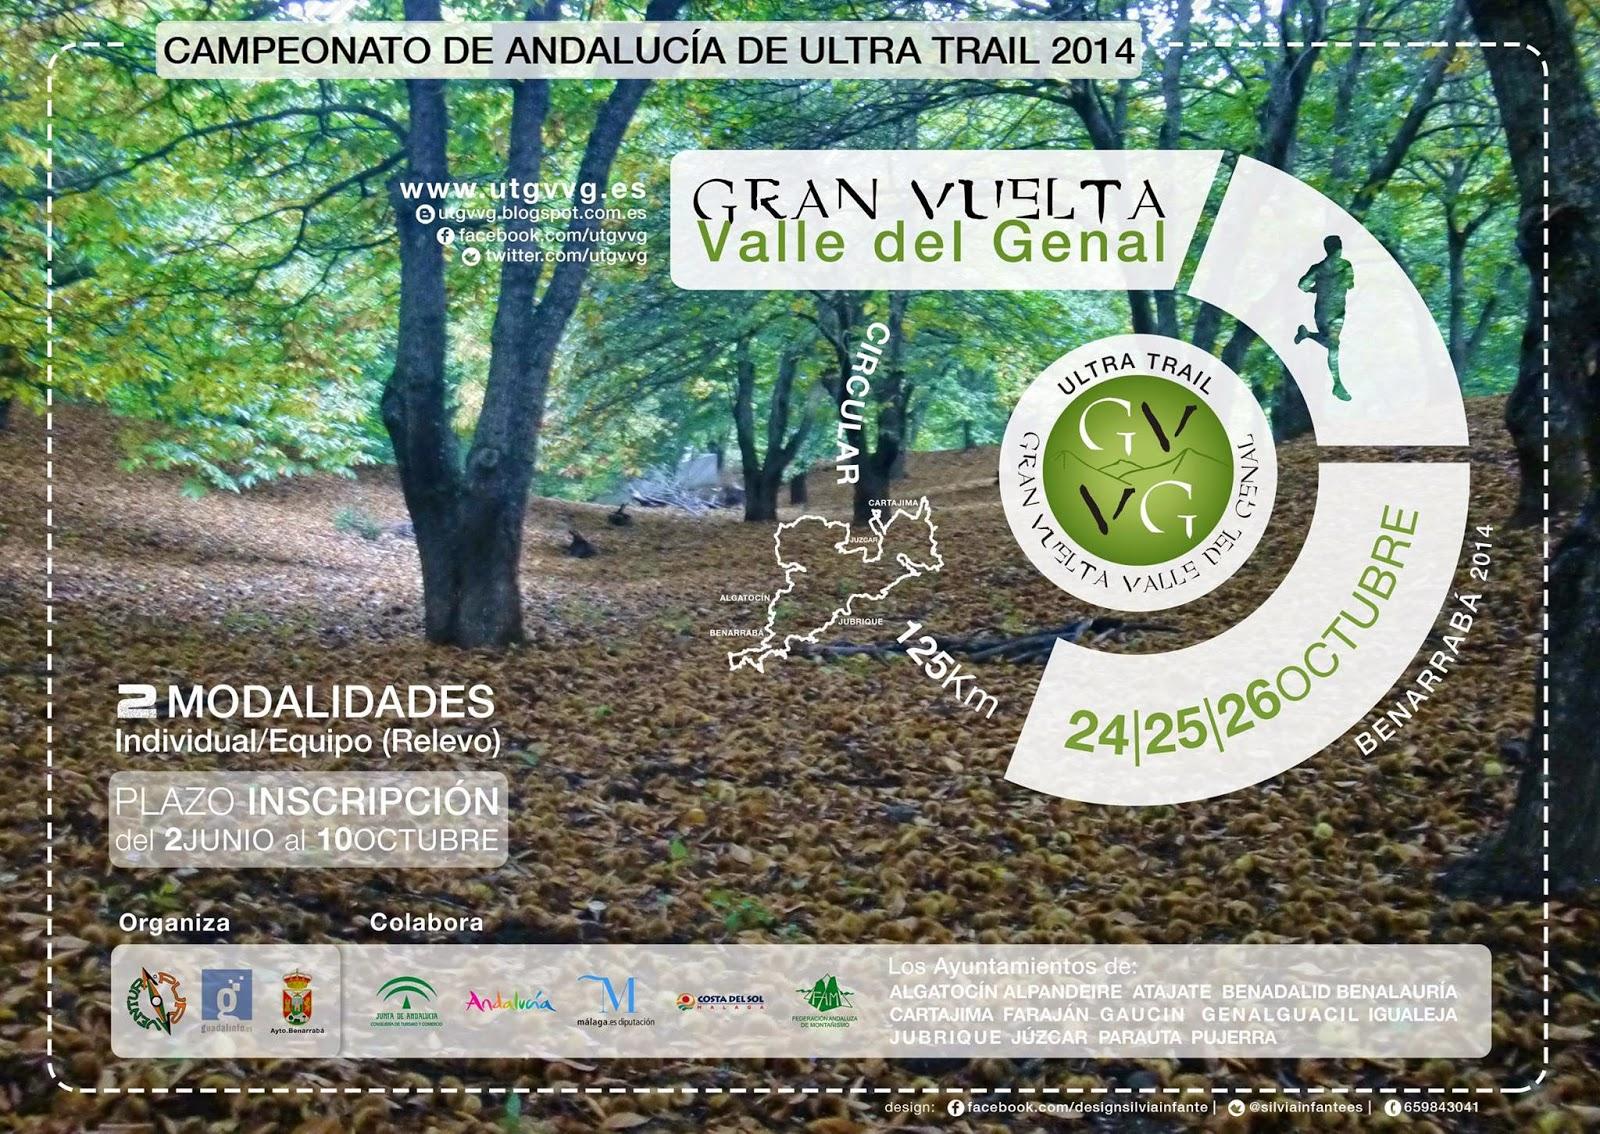 La II Gran Vuelta Valle del Genal llega este fin de semana a Málaga